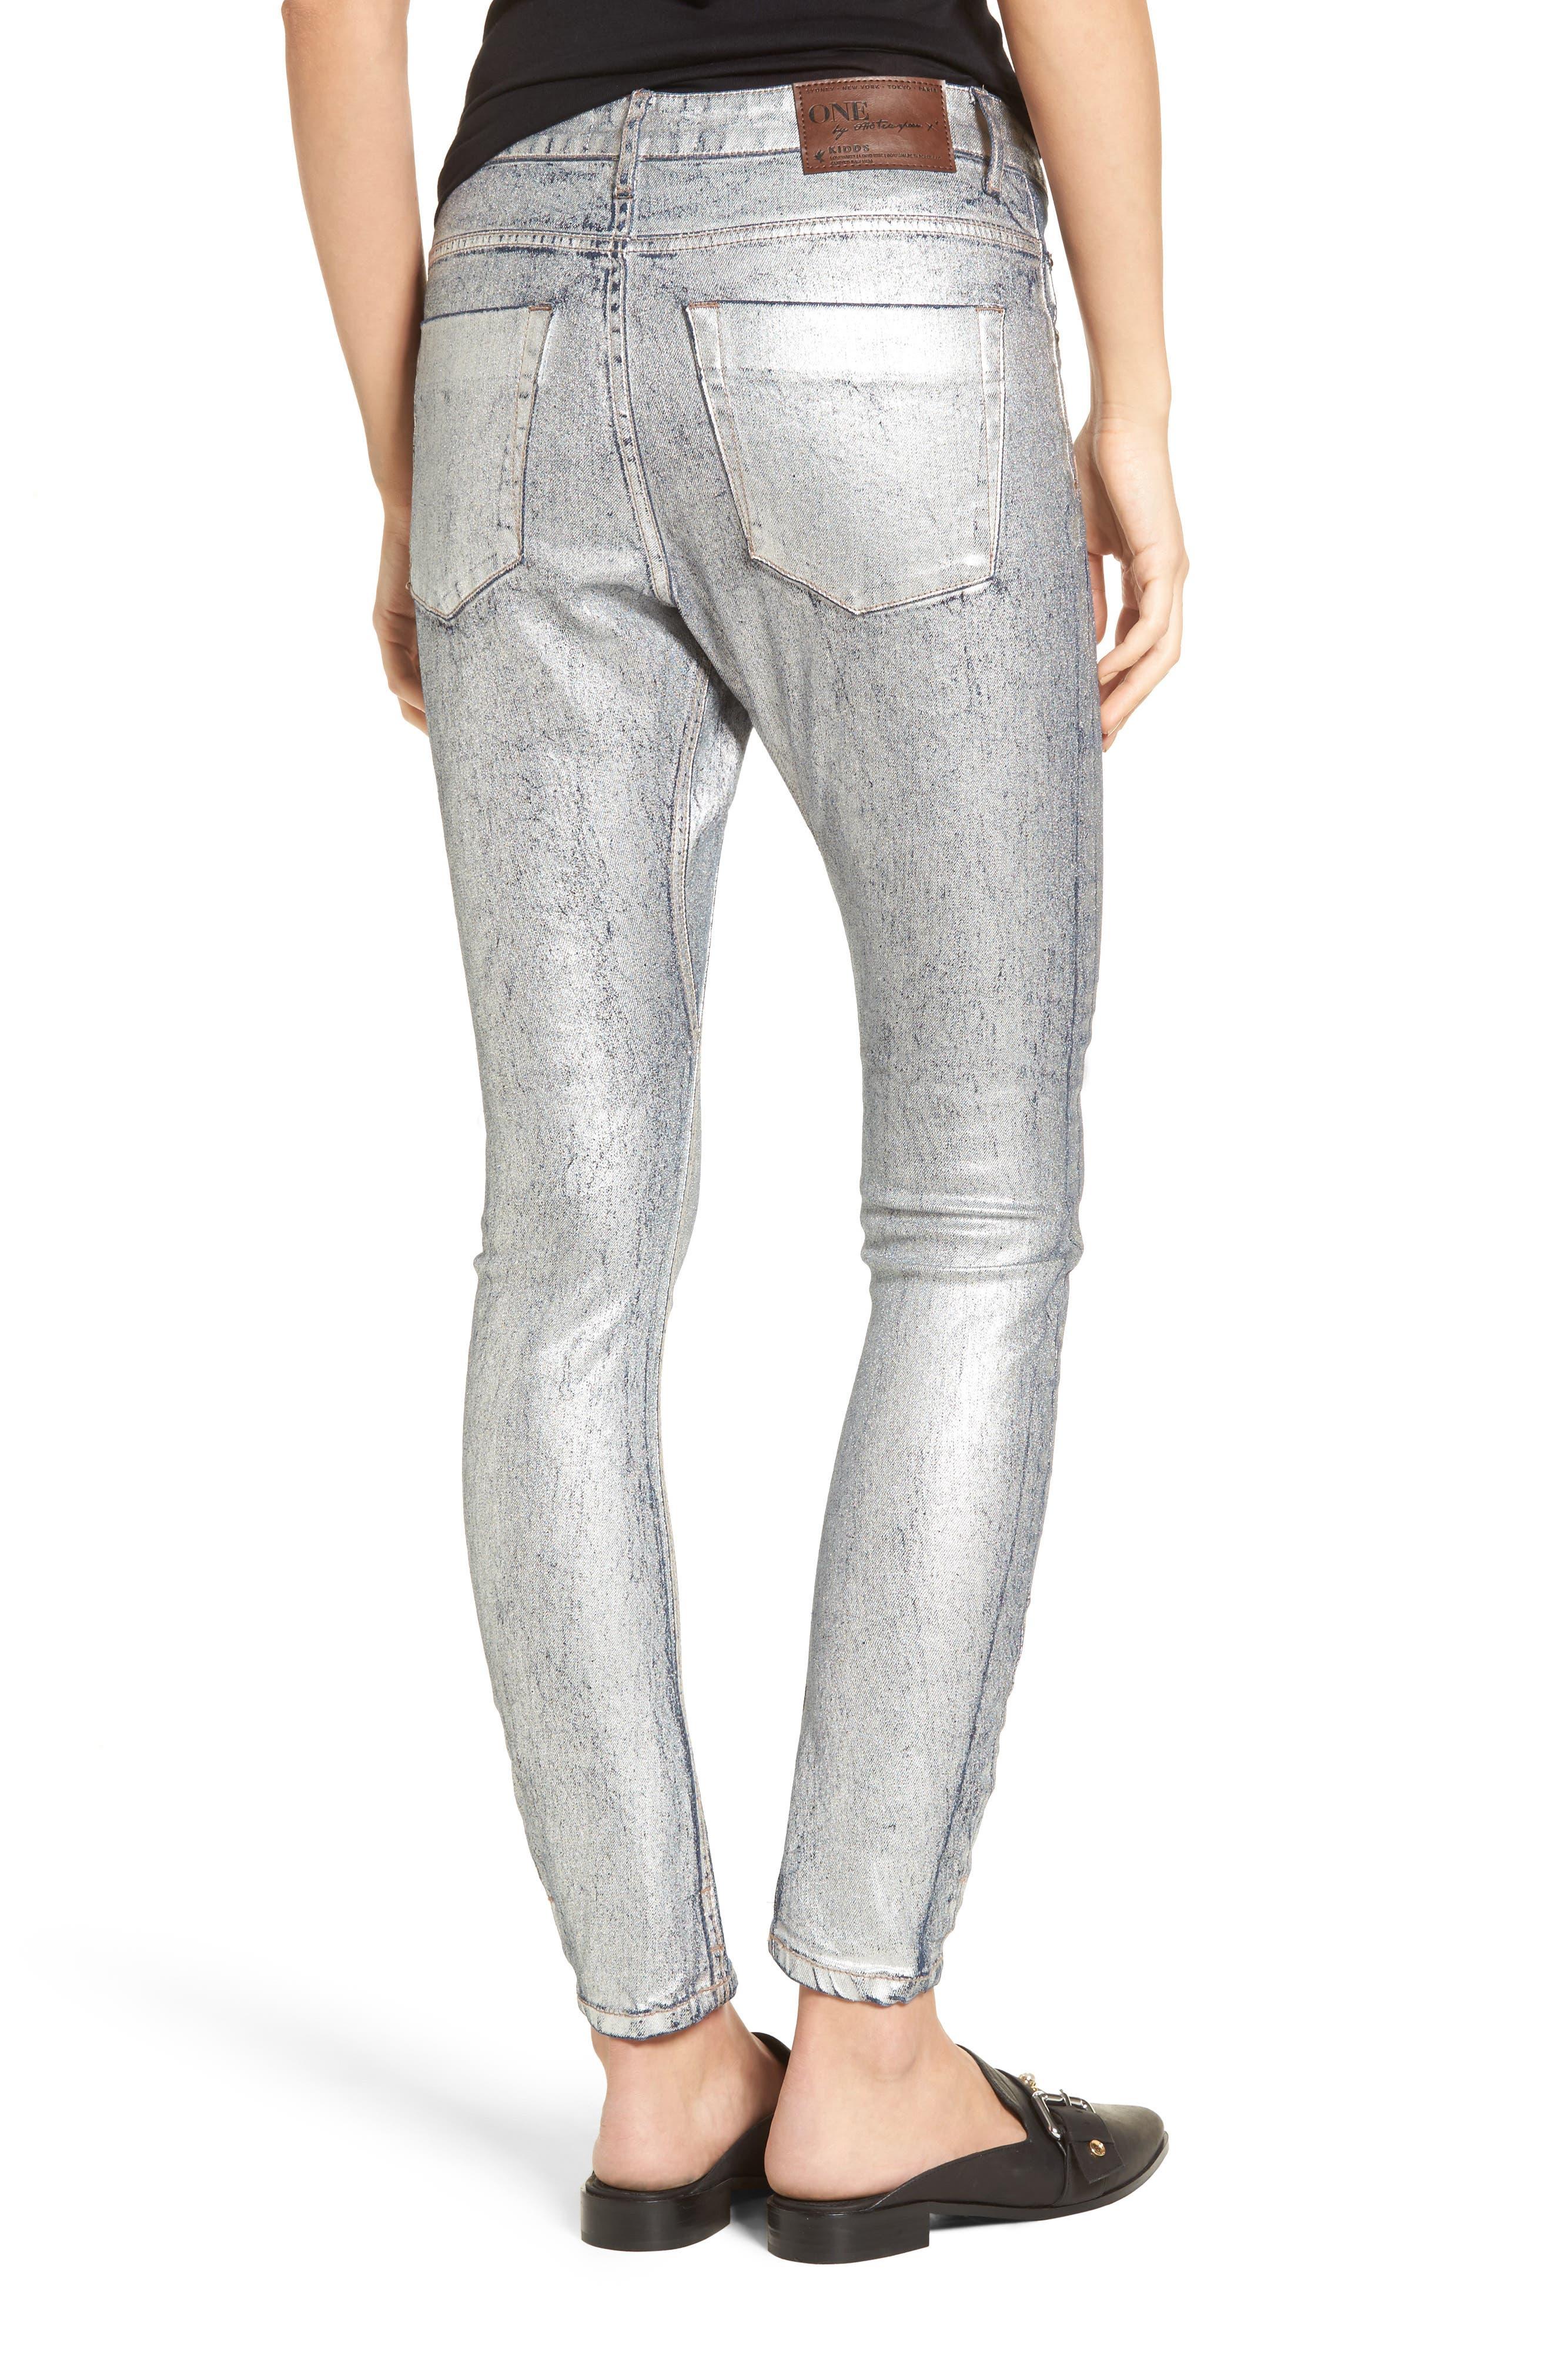 Kidds Metallic Drop Crotch Skinny Jeans,                             Alternate thumbnail 2, color,                             040